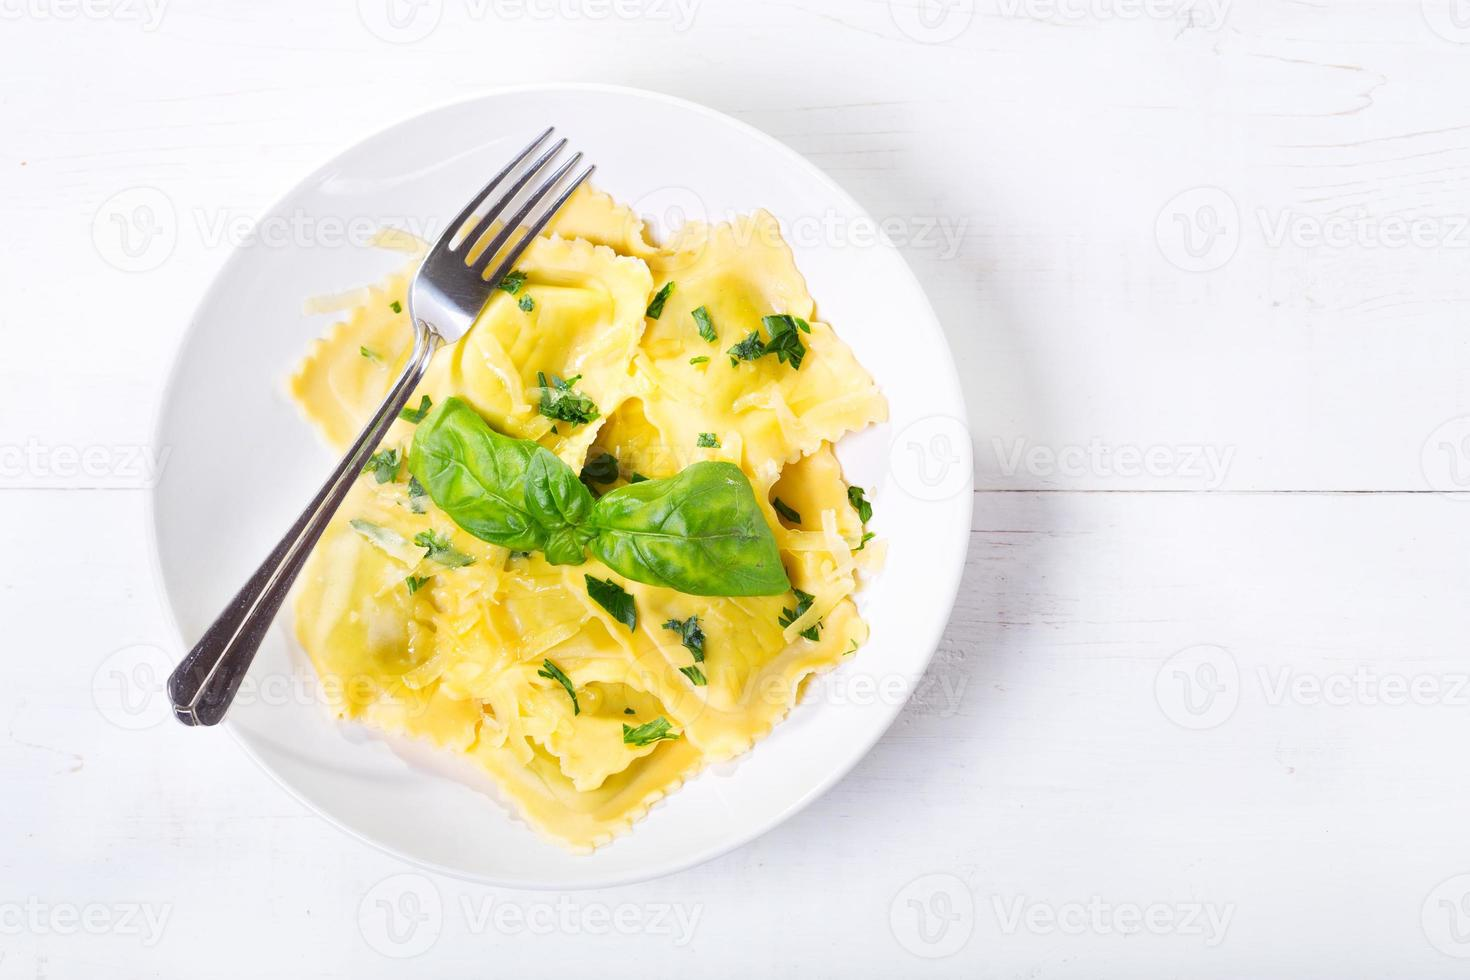 plaat van ravioli met basilicum foto